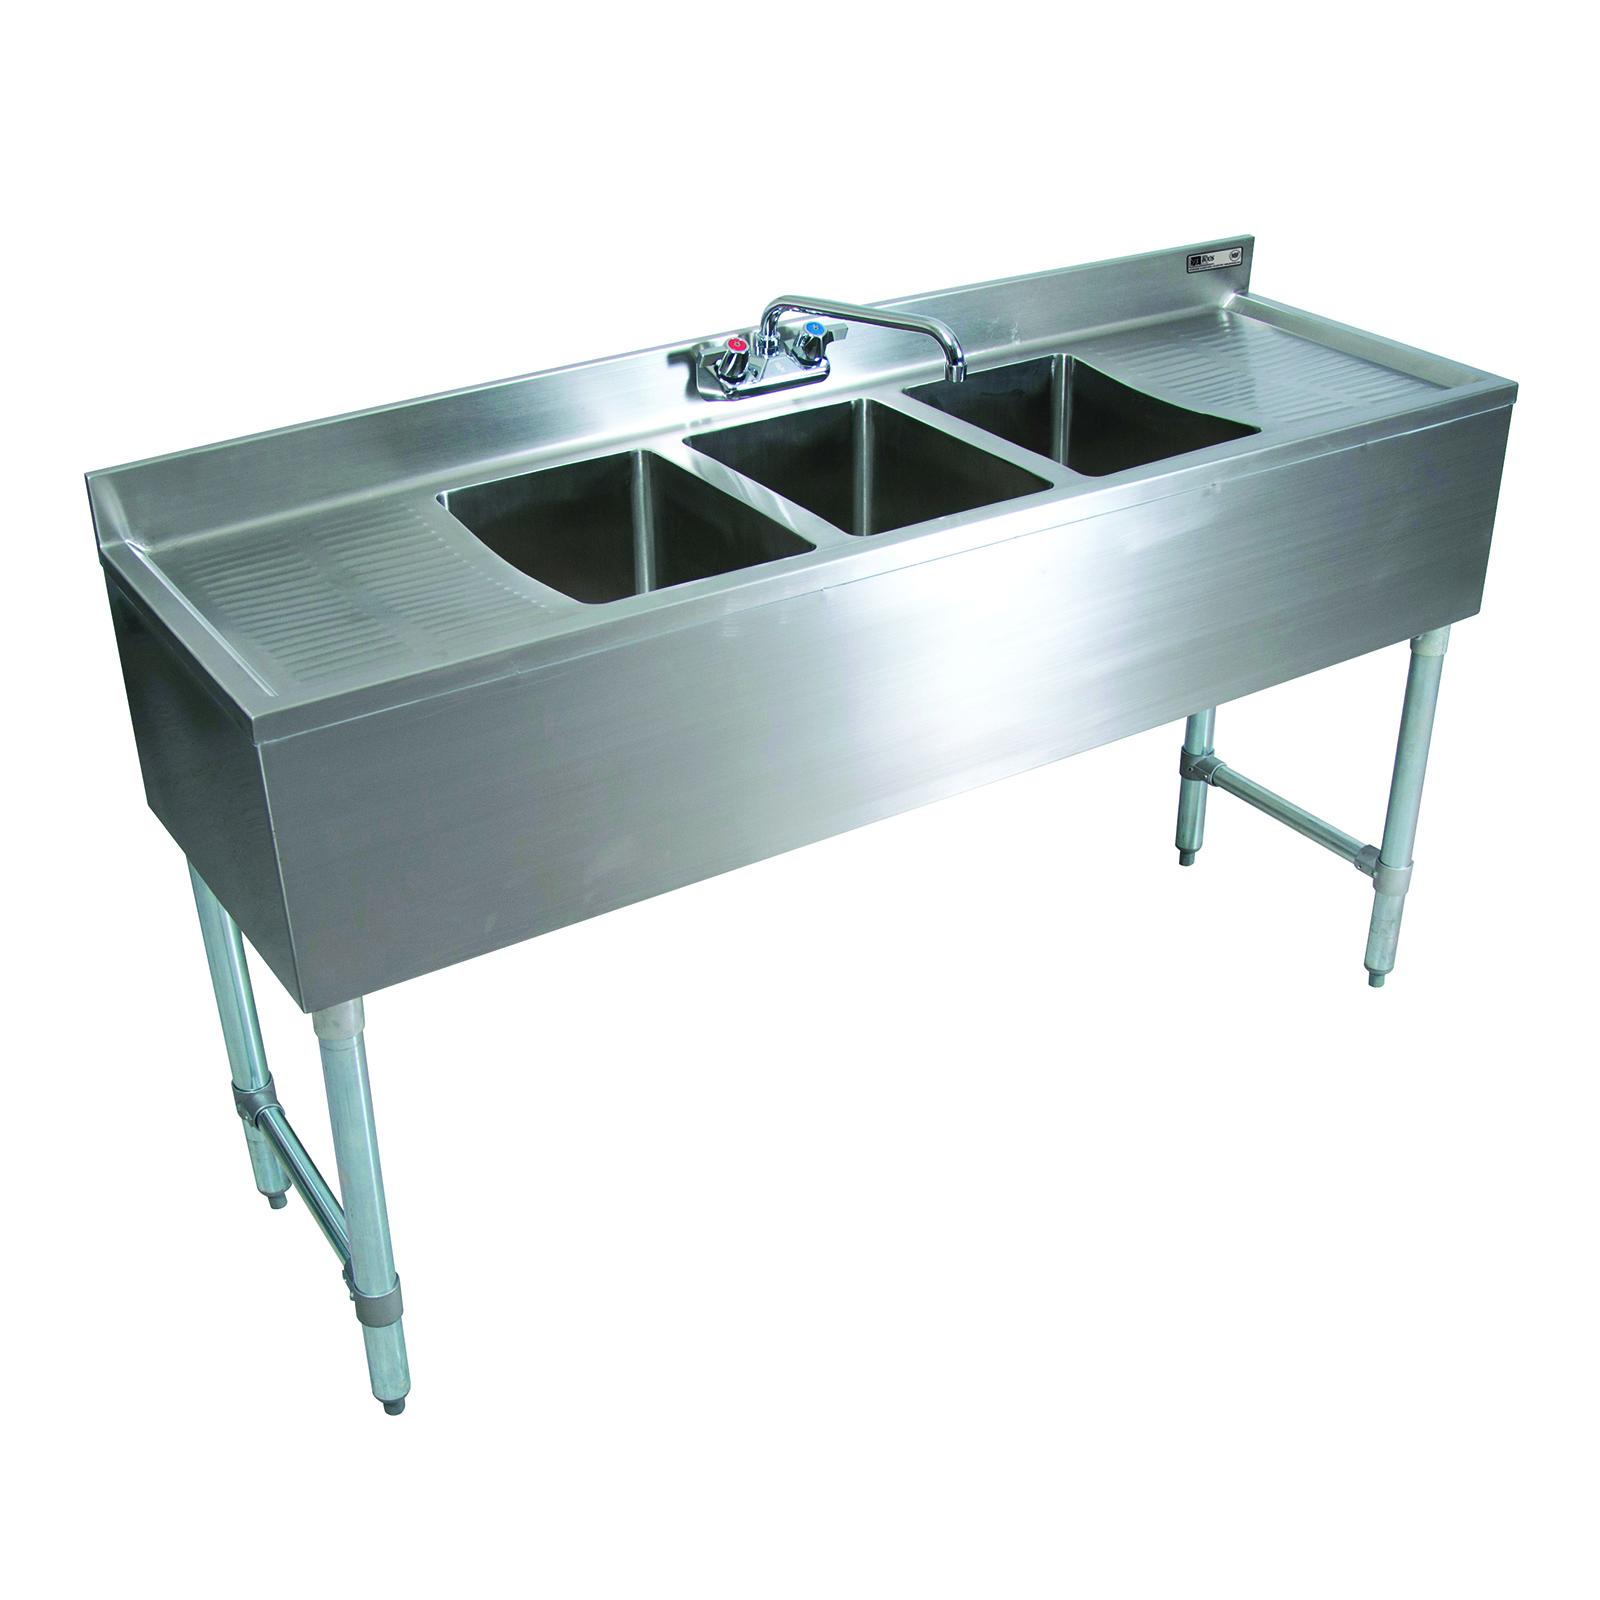 John Boos EUB2S36-1LD underbar sink units